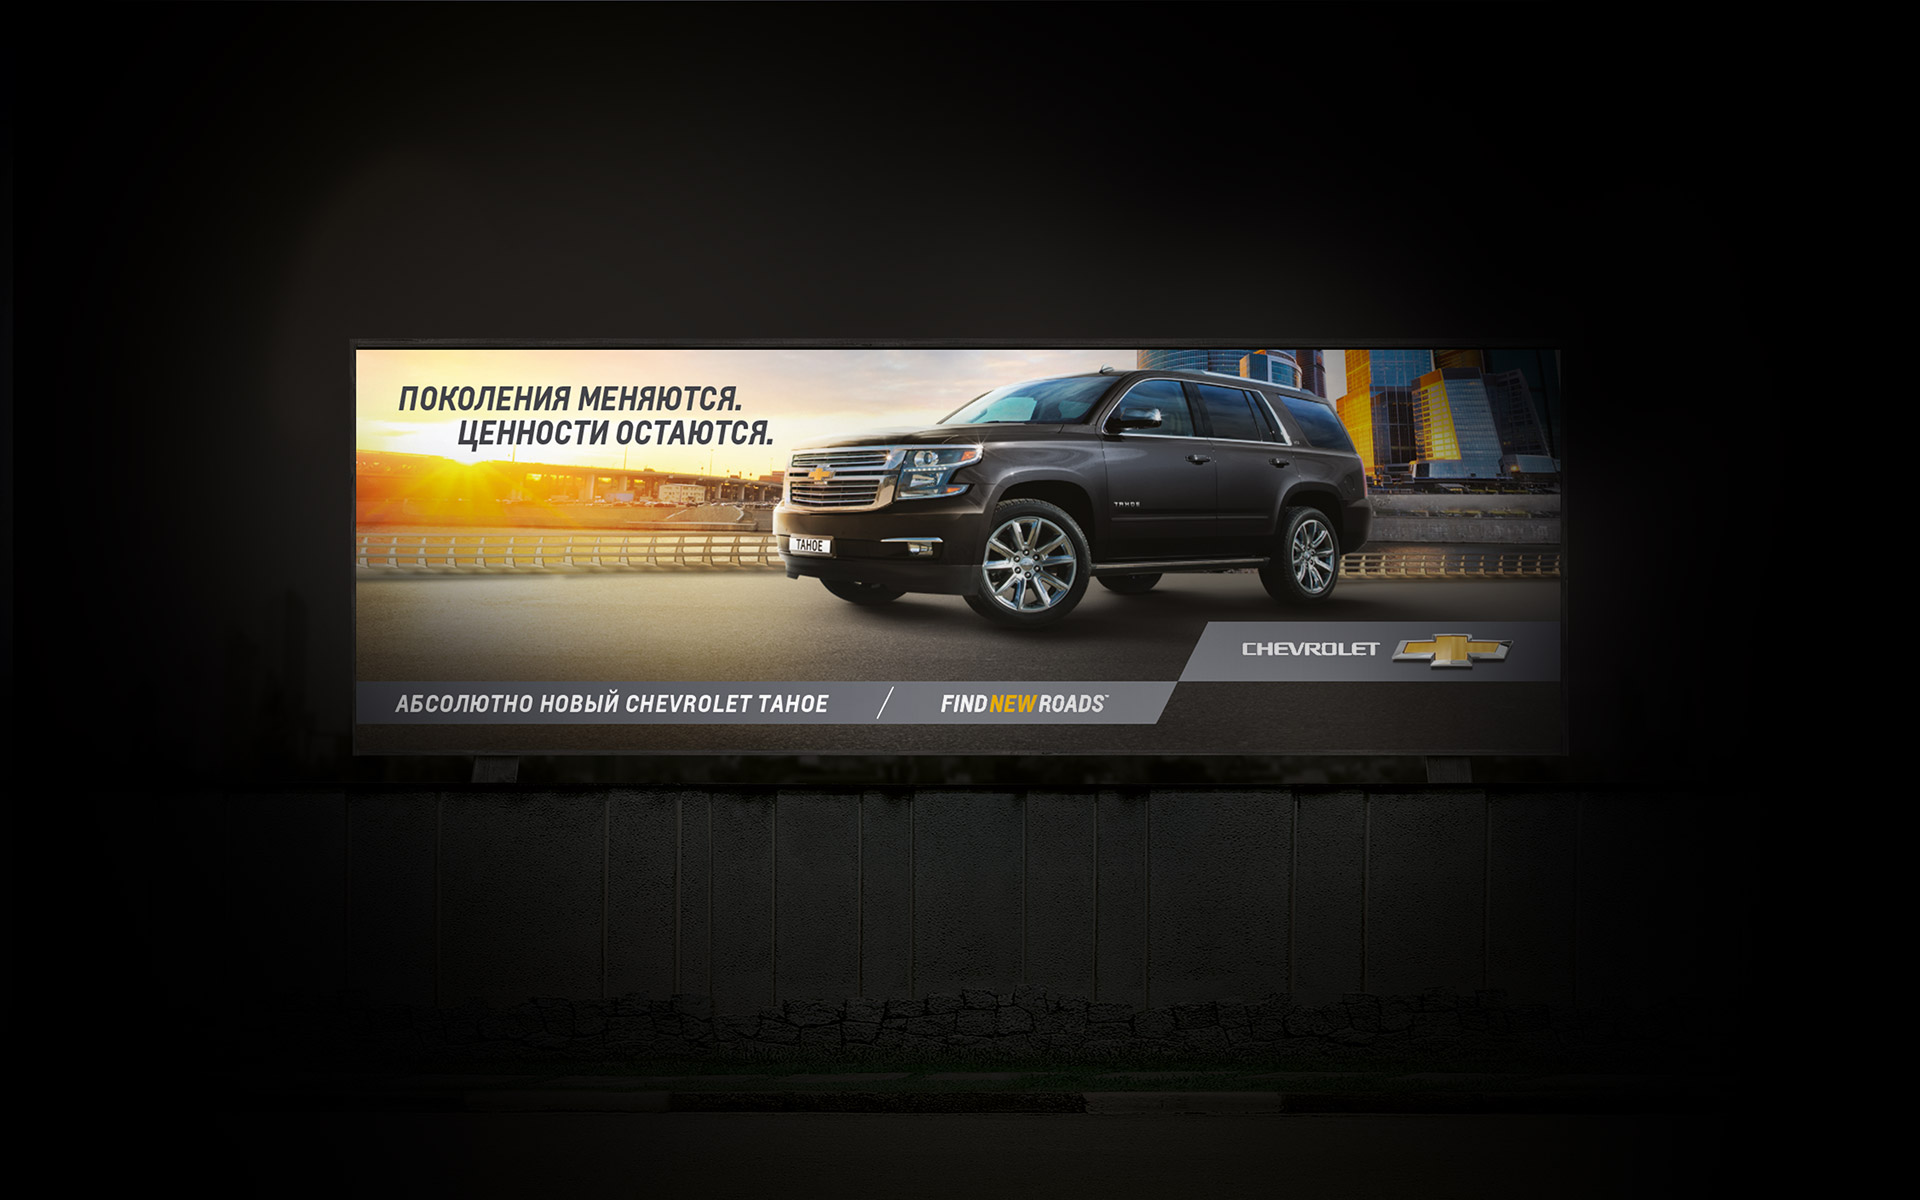 Chevrolet Tahoe 2015 advertising.